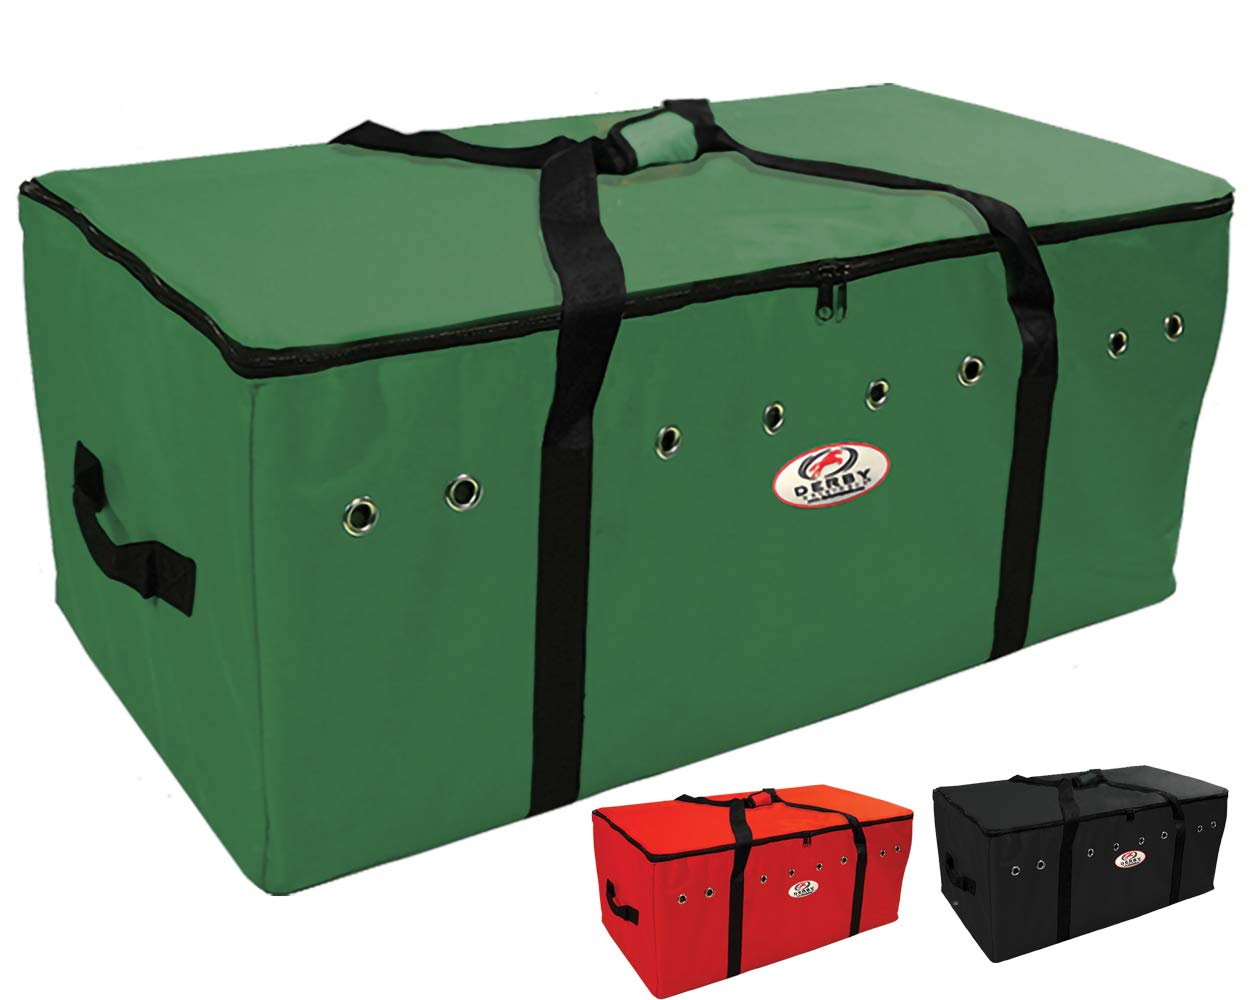 Derby Originals Heavy Duty 3 Layer Bottom Full Bale Bags, 44'' x 22'' x 18'', Hunter Green by Derby Originals